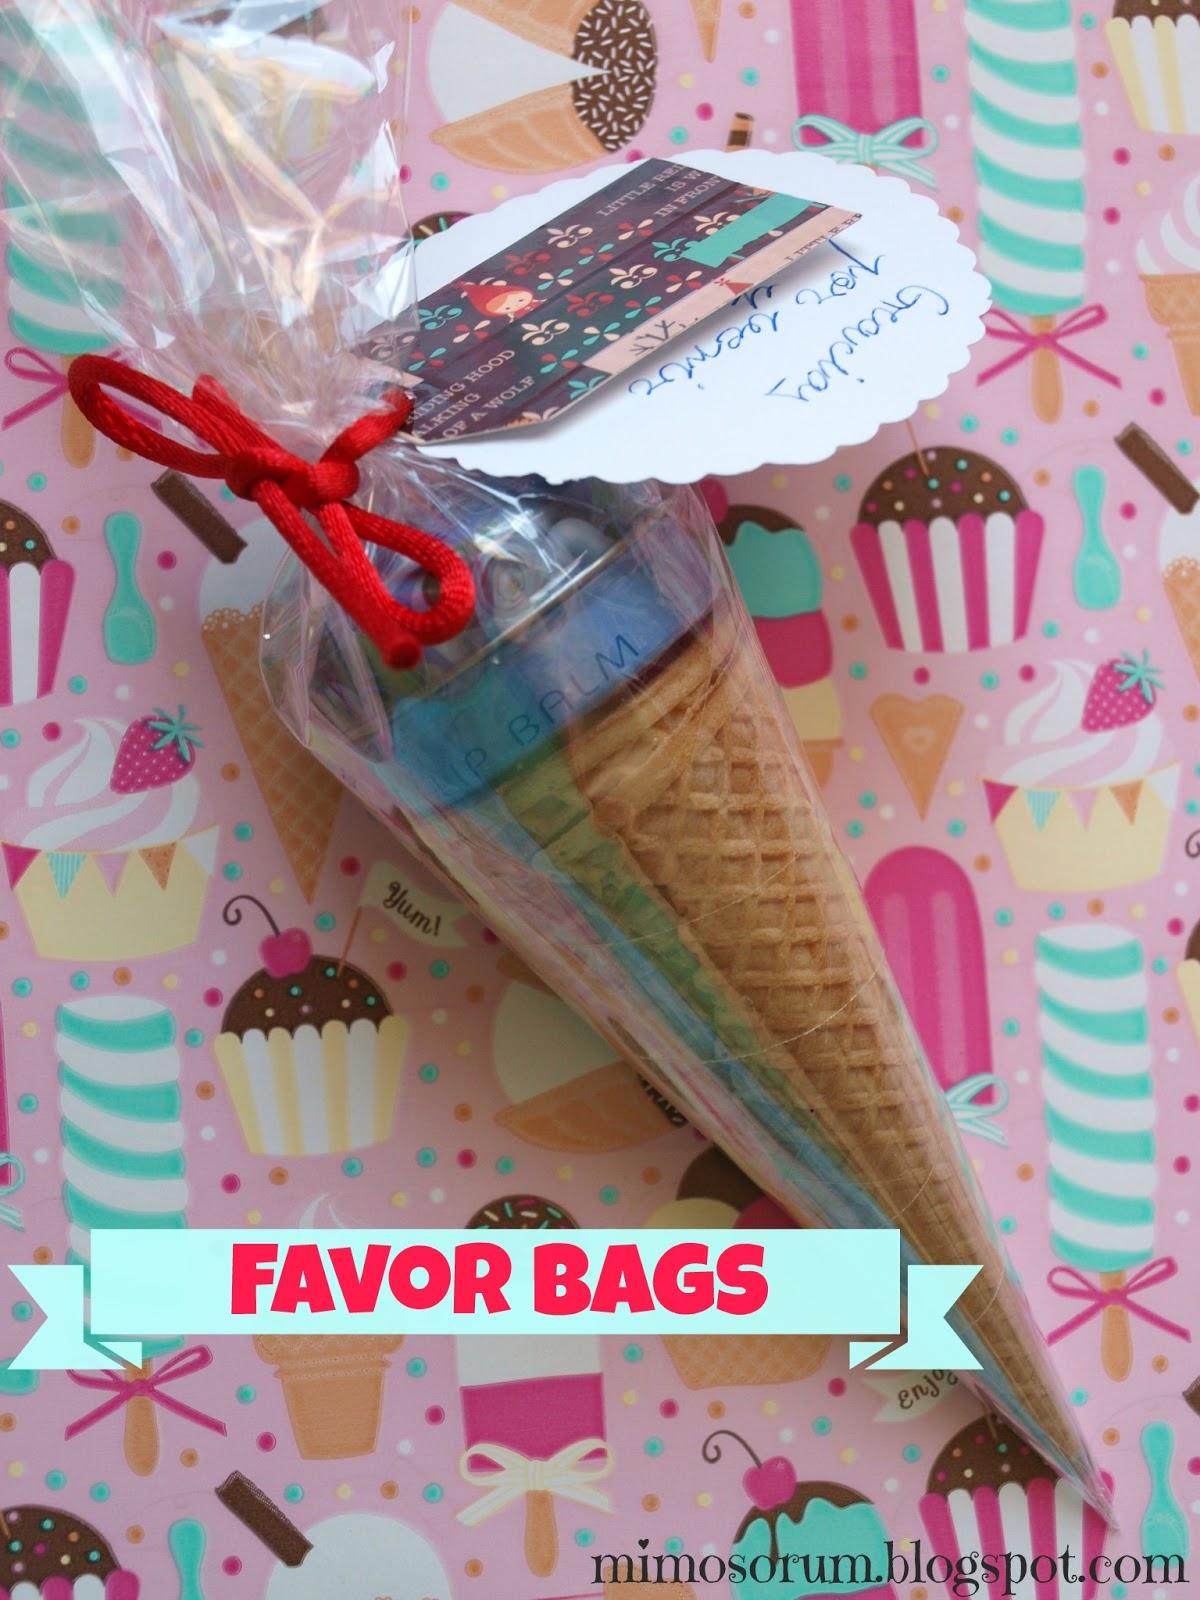 Favor Bags. Mimosorum